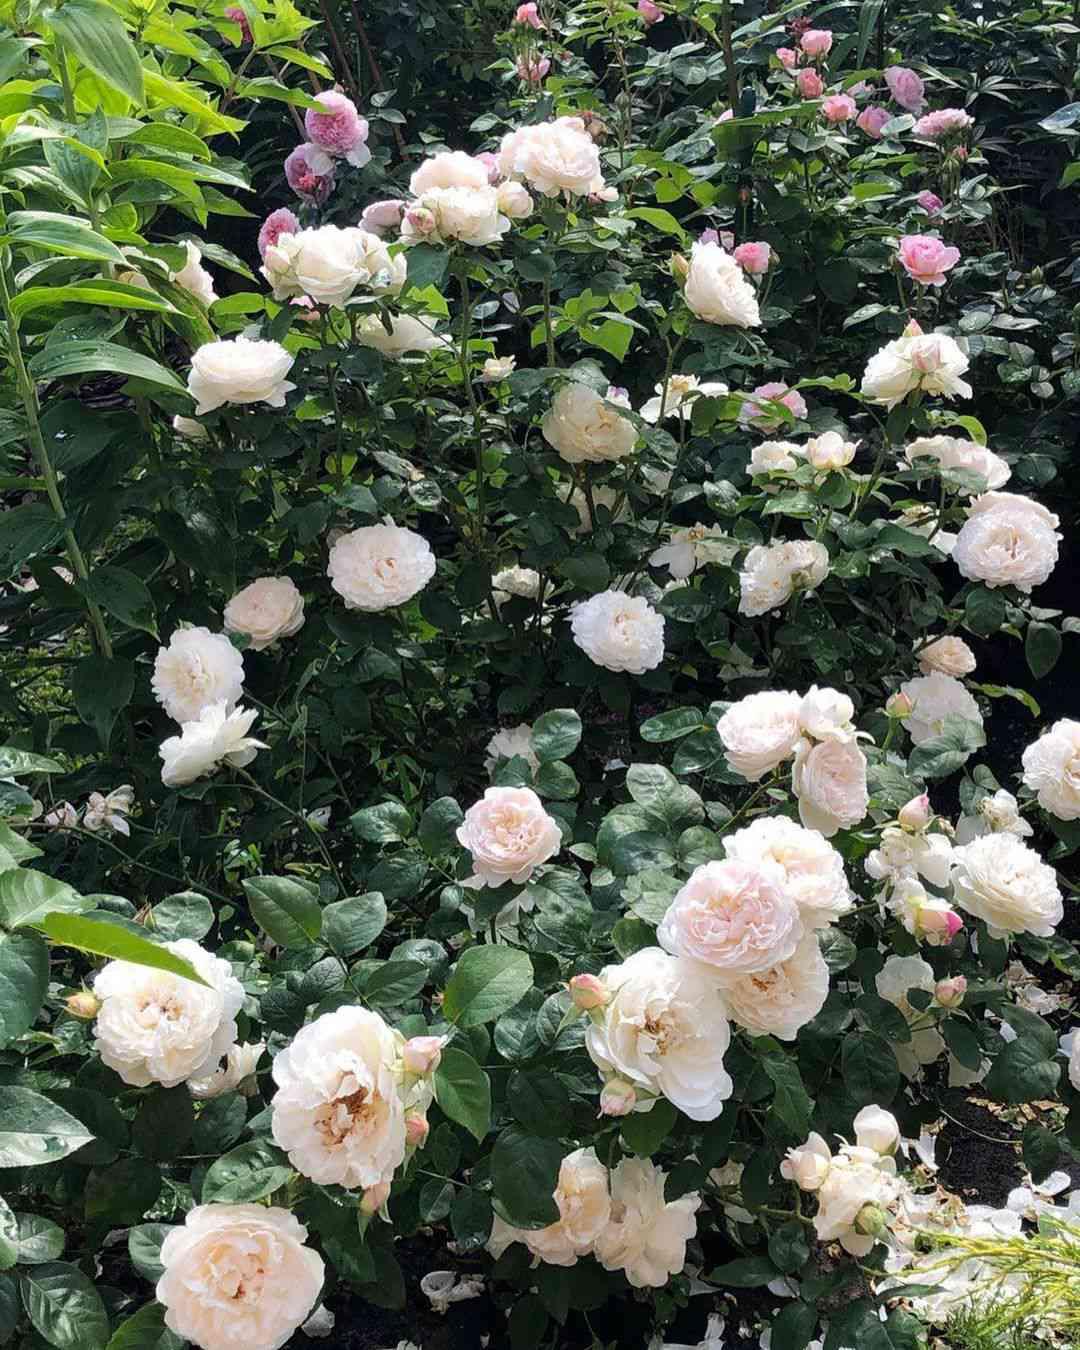 Light pink roses.